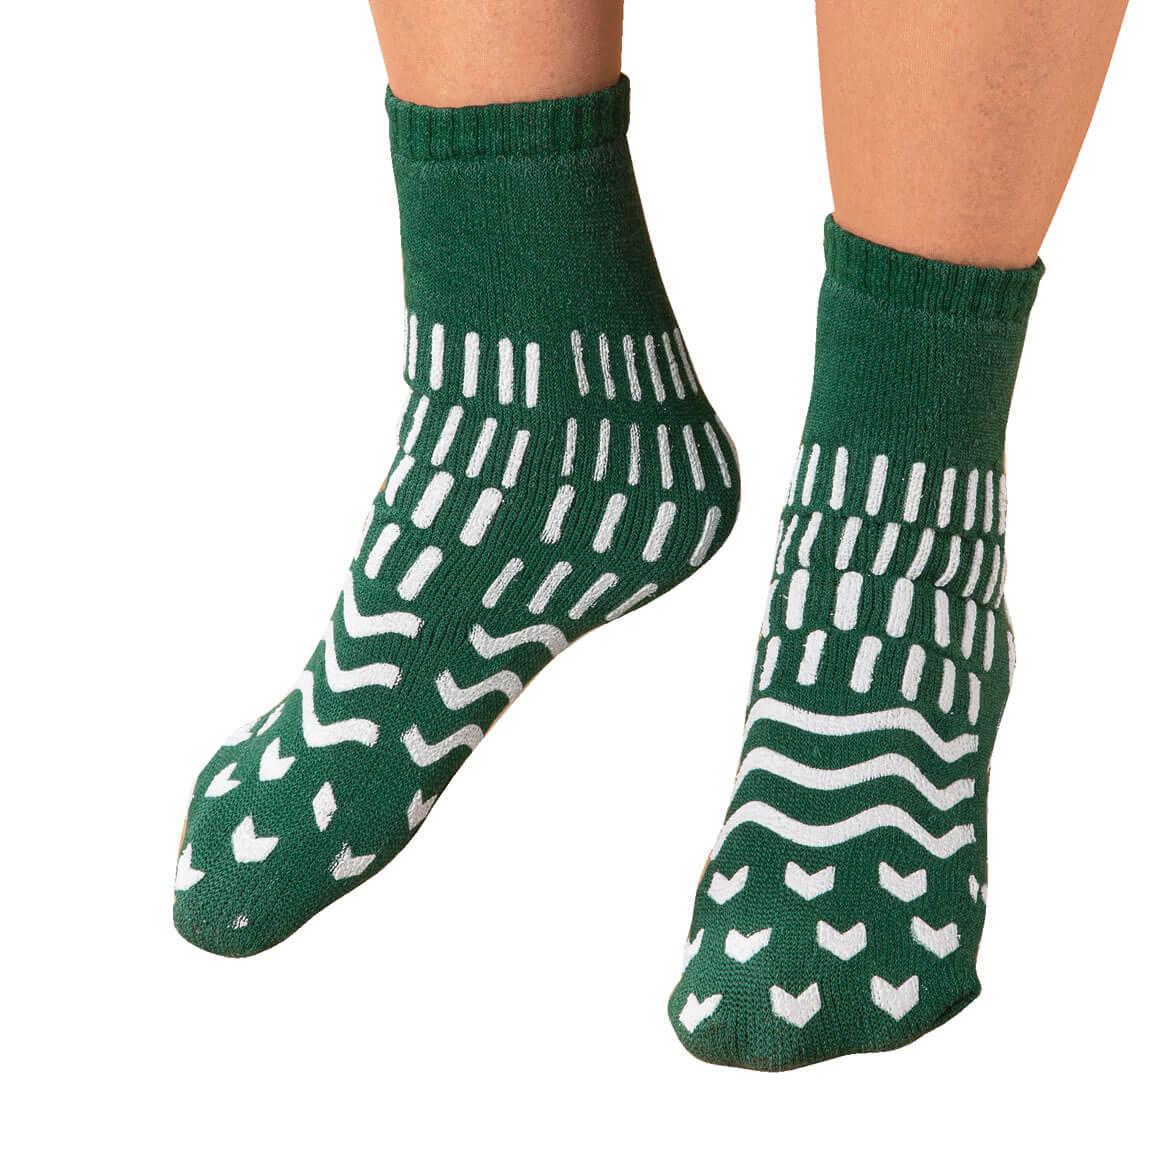 Confetti Treads™ Safety Socks-346960